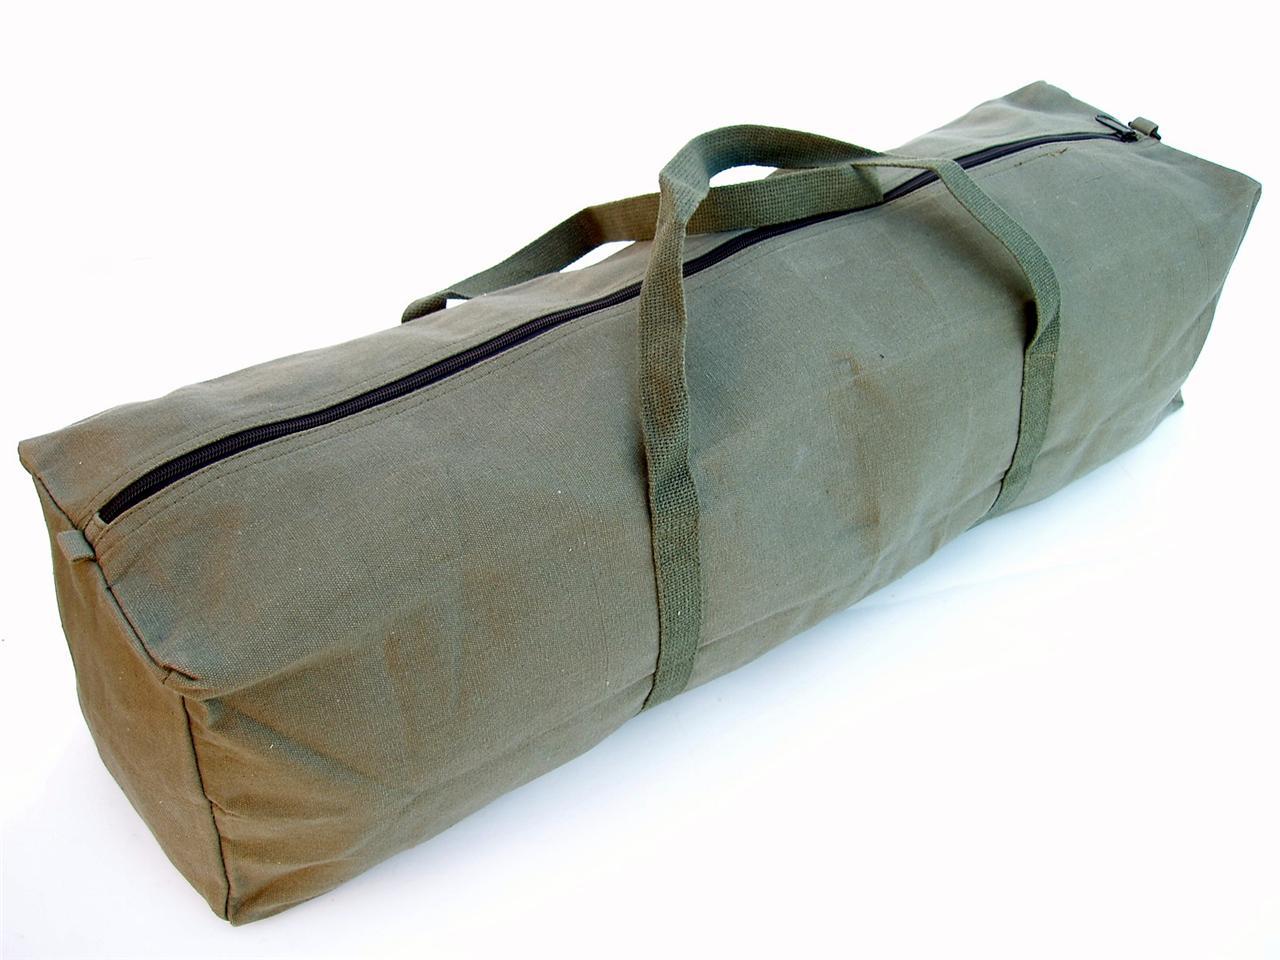 New Heavy Duty Canvas Tool Carry Bag Travel Luggage Duffel